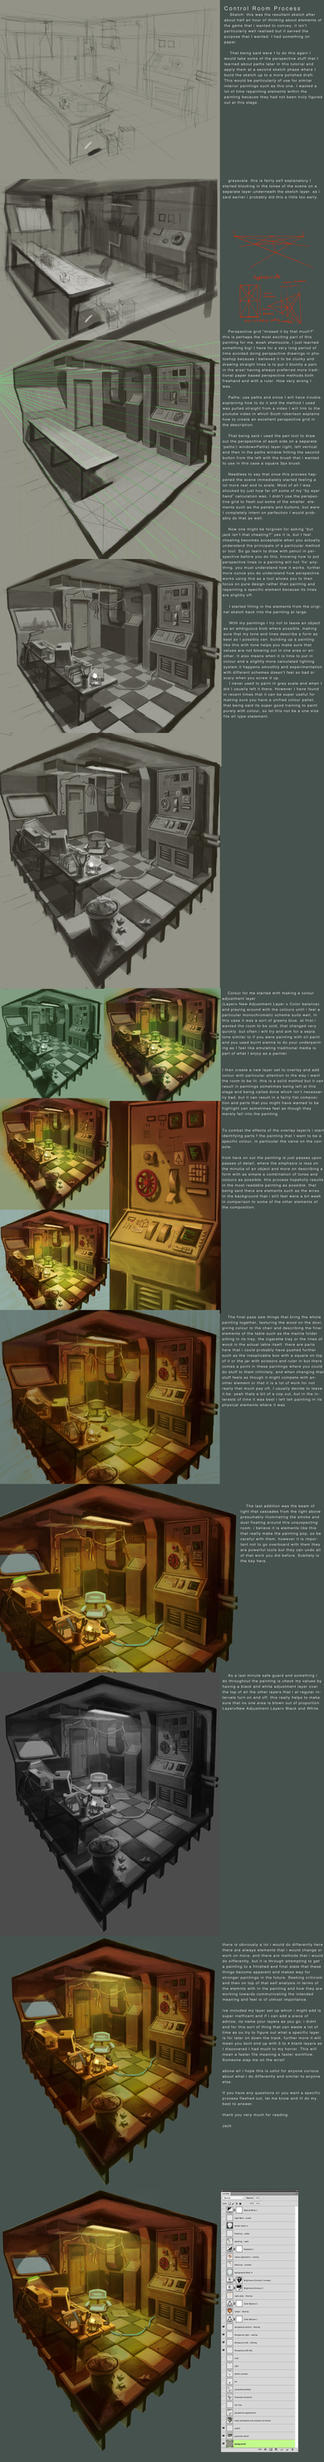 Conrol Room Tutorial. by Jack-Kirby-Crosby